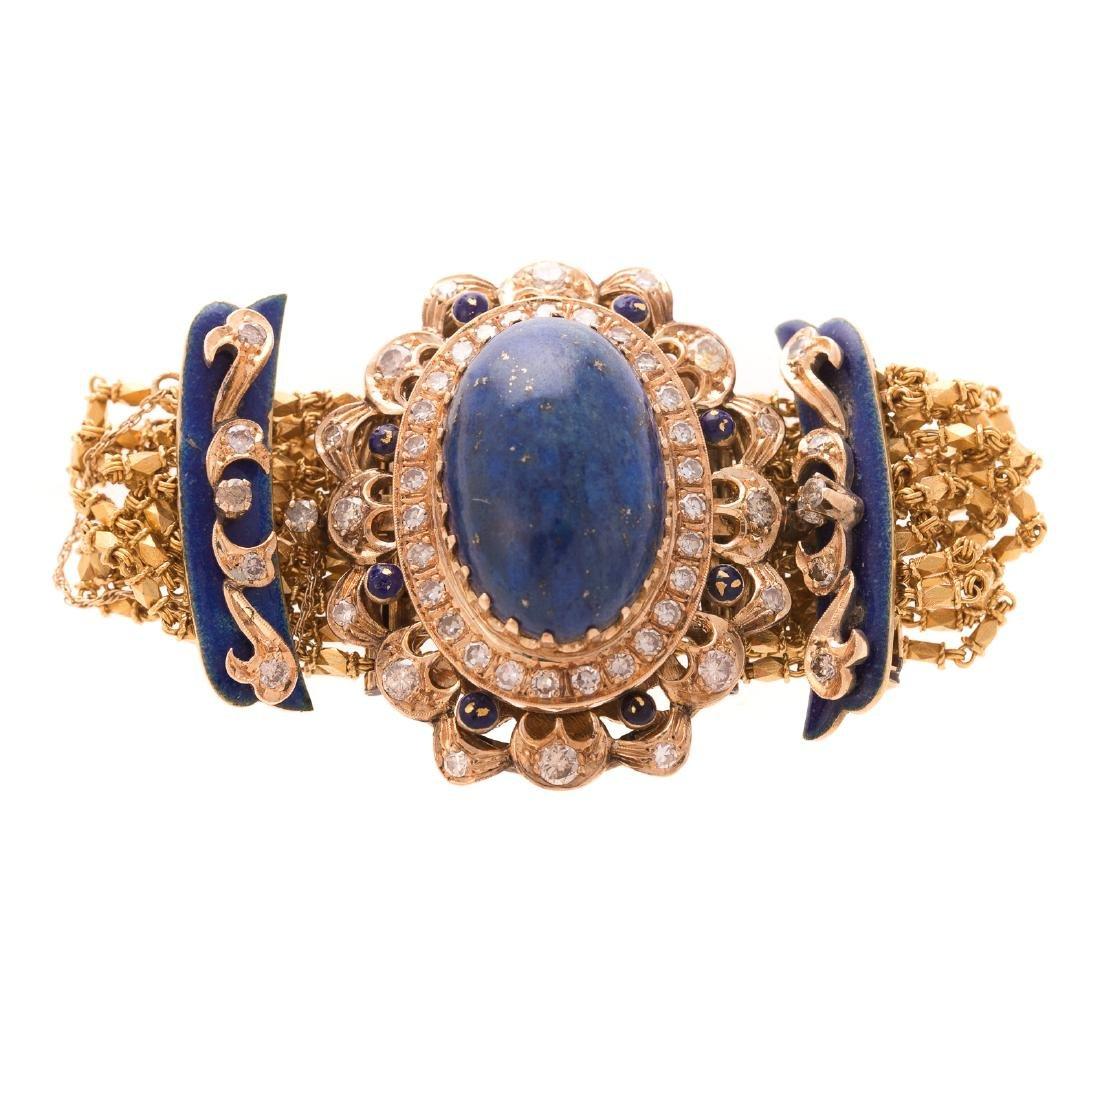 A Victorian 18K Lapis, Diamond & Enamel Bracelet